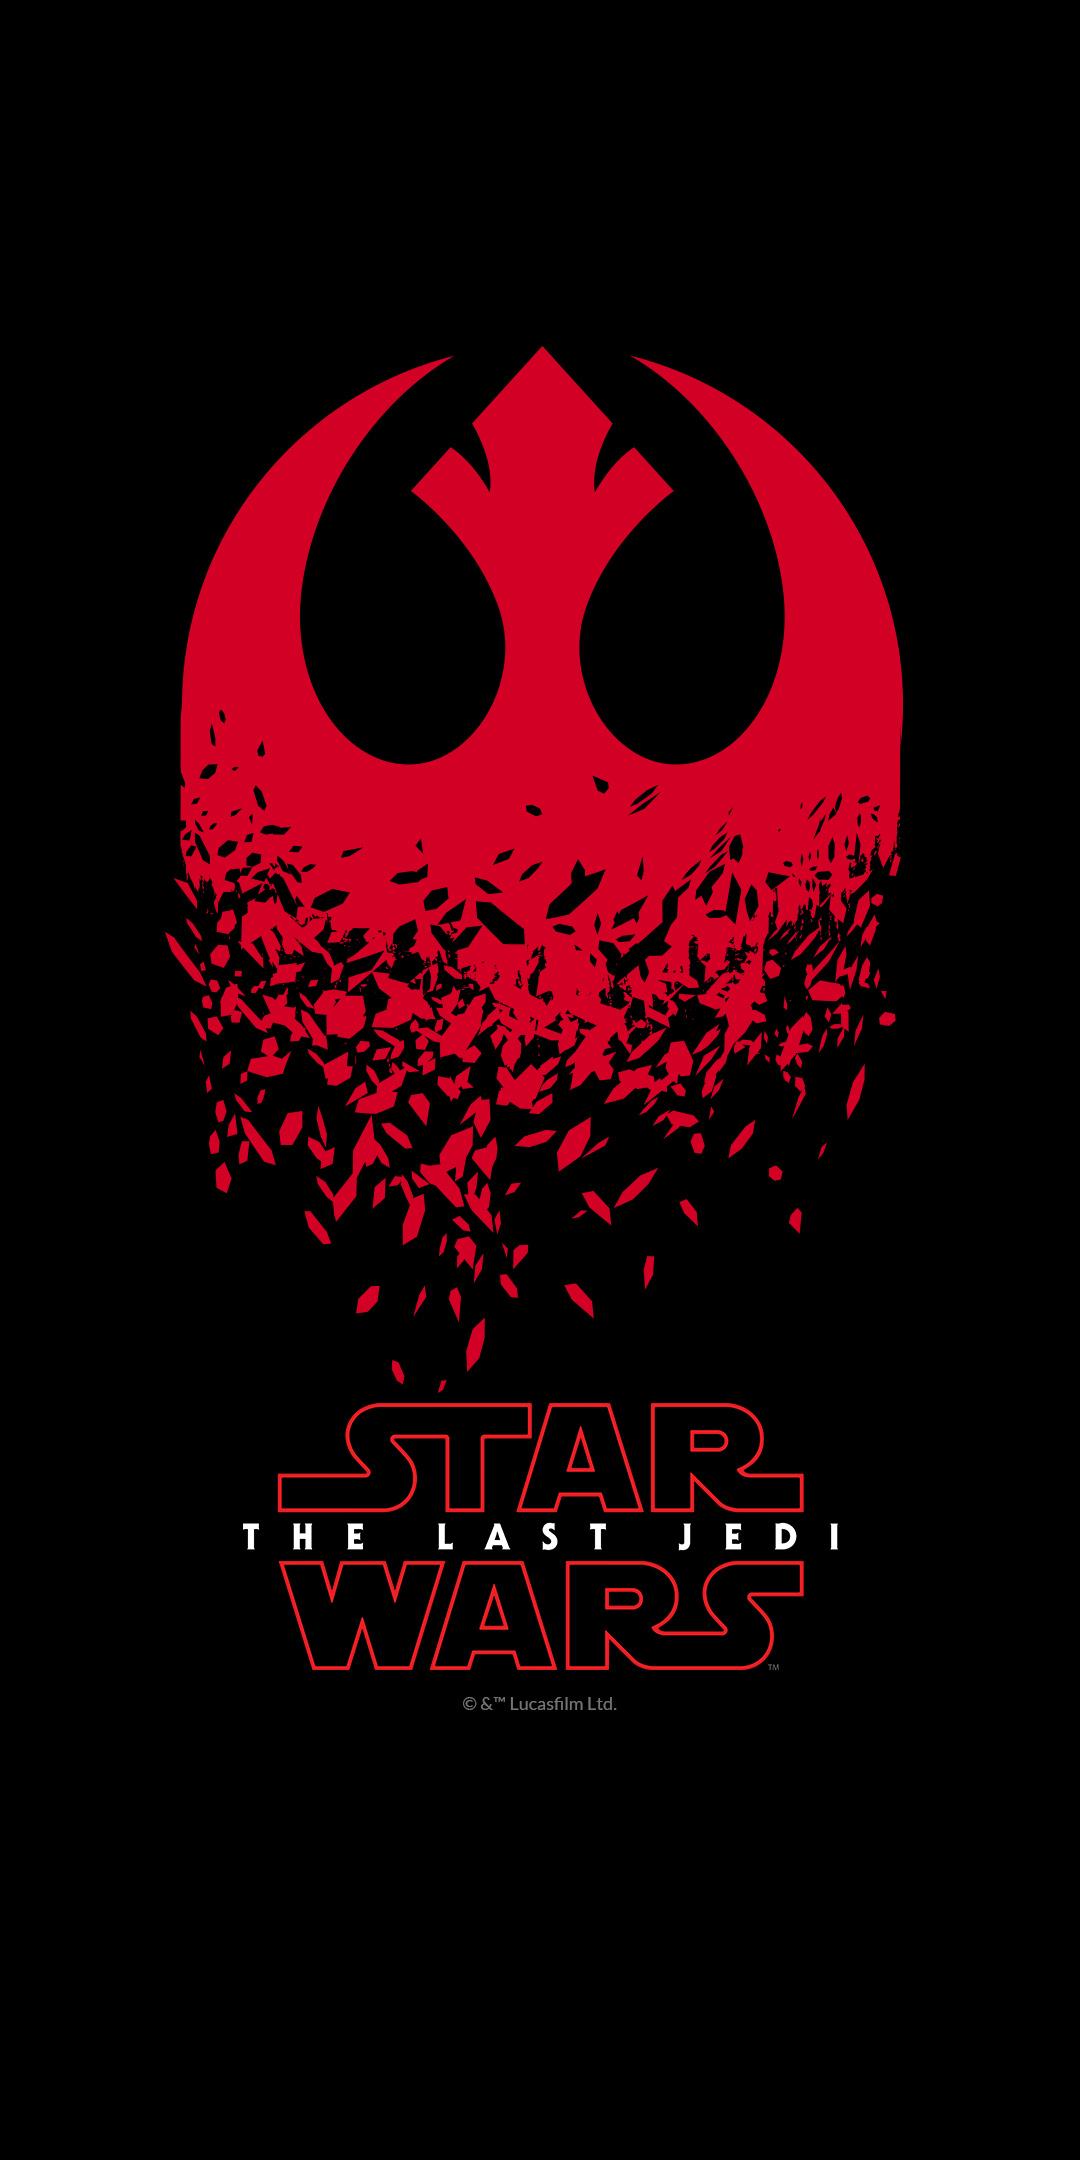 Star Wars The Last Jedi Movie Poster.